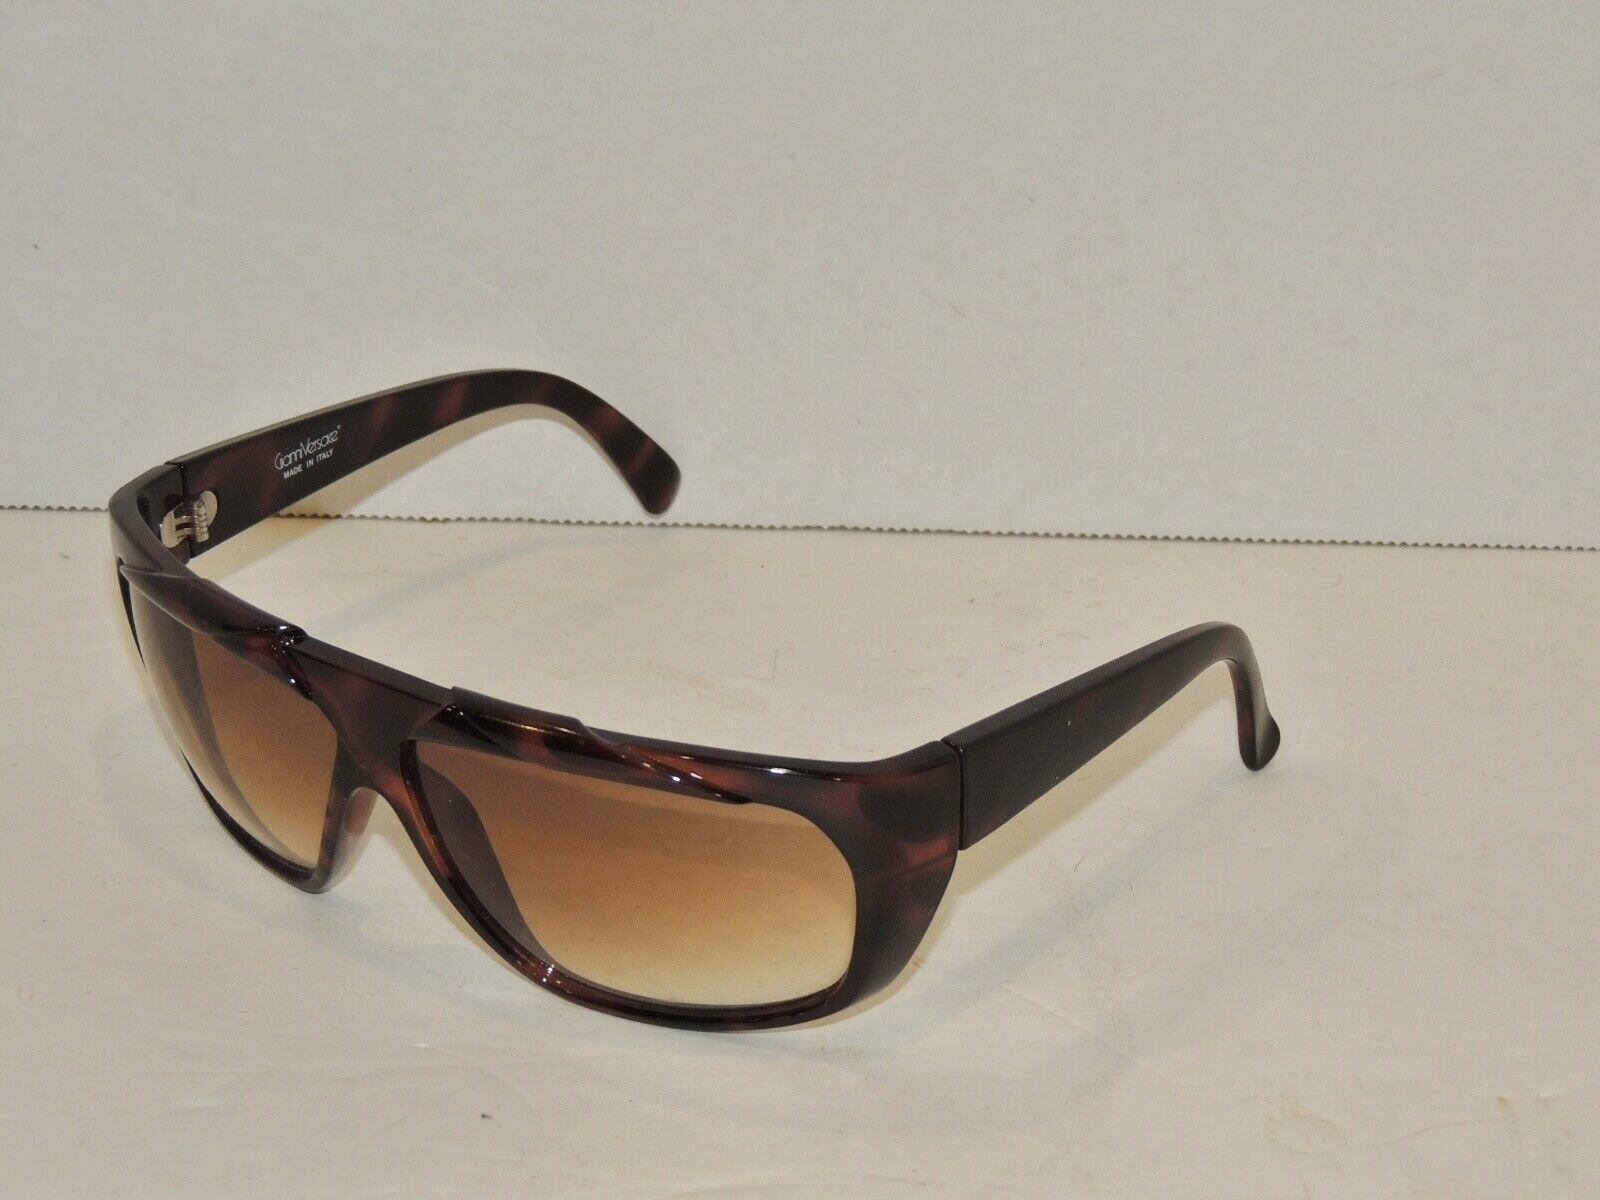 Gianni Versace Basix Brown Sunglasses  - image 5